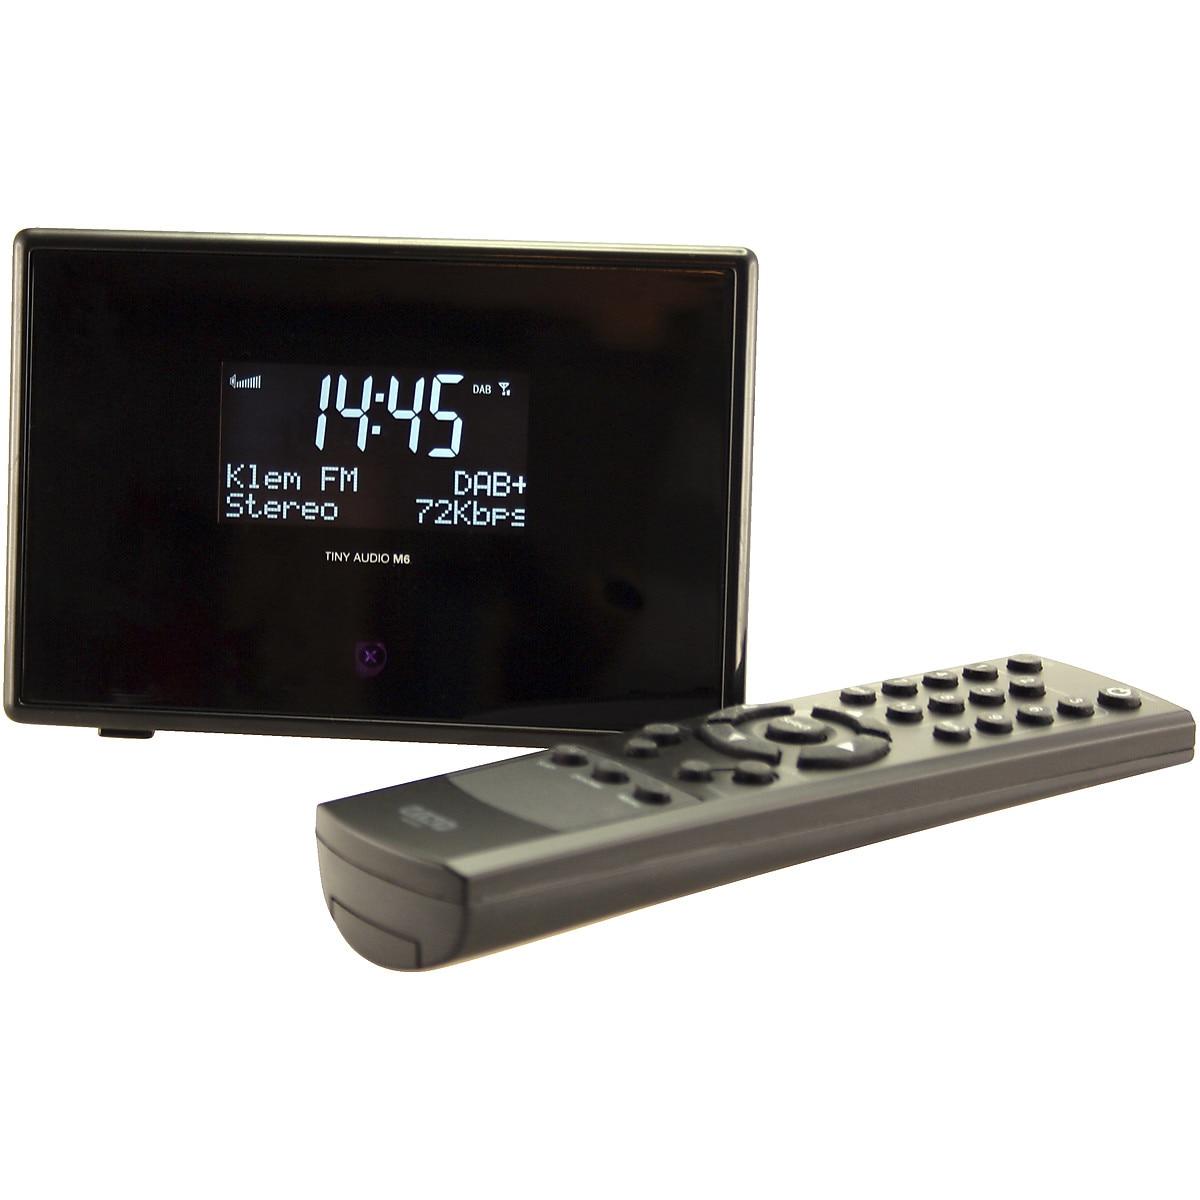 Tiny Audio M6 DAB+/FM-adapter